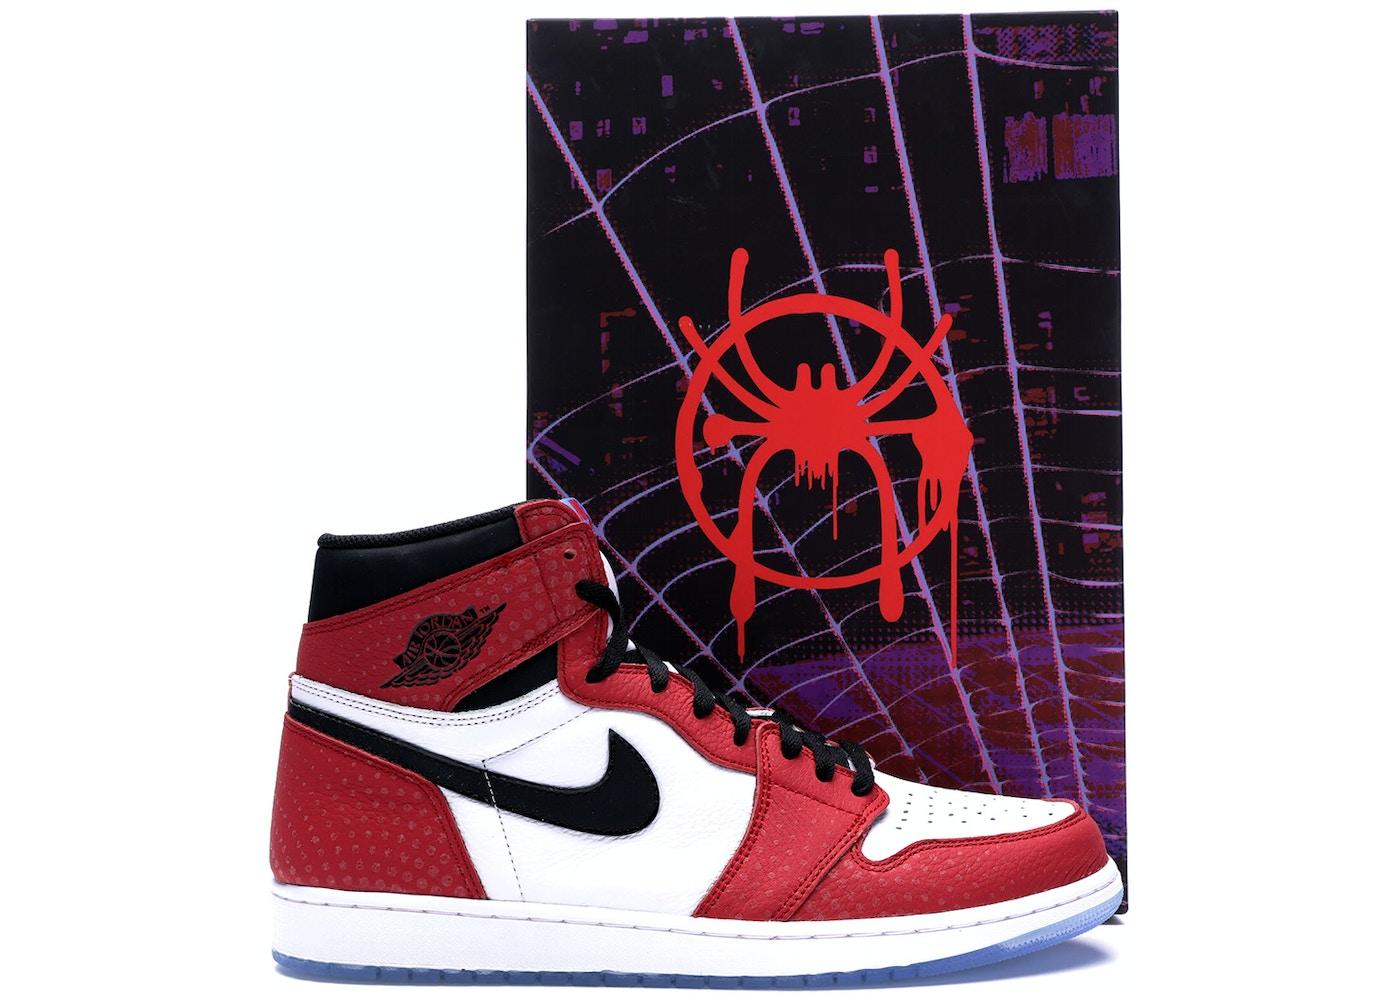 online store c5456 4ed33 Jordan 1 Retro High Spider Man Origin Story (Special Box)